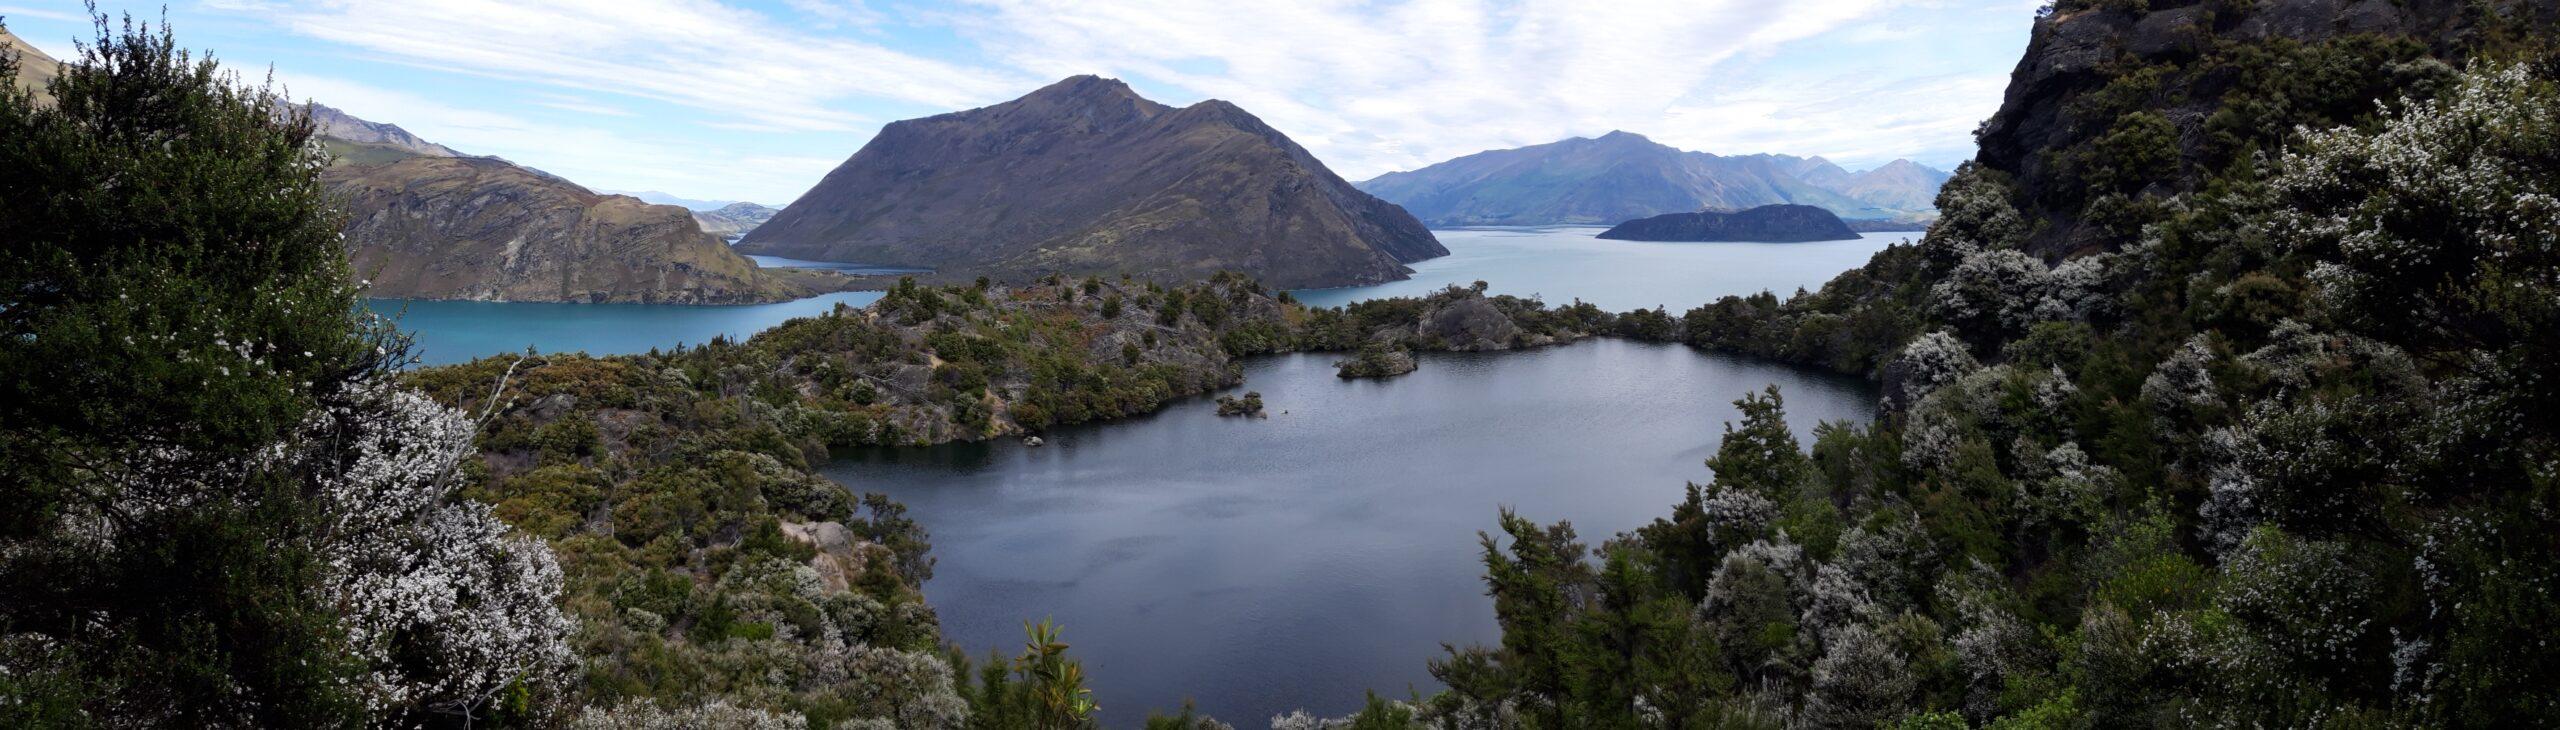 20191221_155502 - Neuseeland - Otago - Wanaka - Wanaka See - Mou Waho Insel - Mou Tapu Insel Manuka (Leptospermum scoparium)